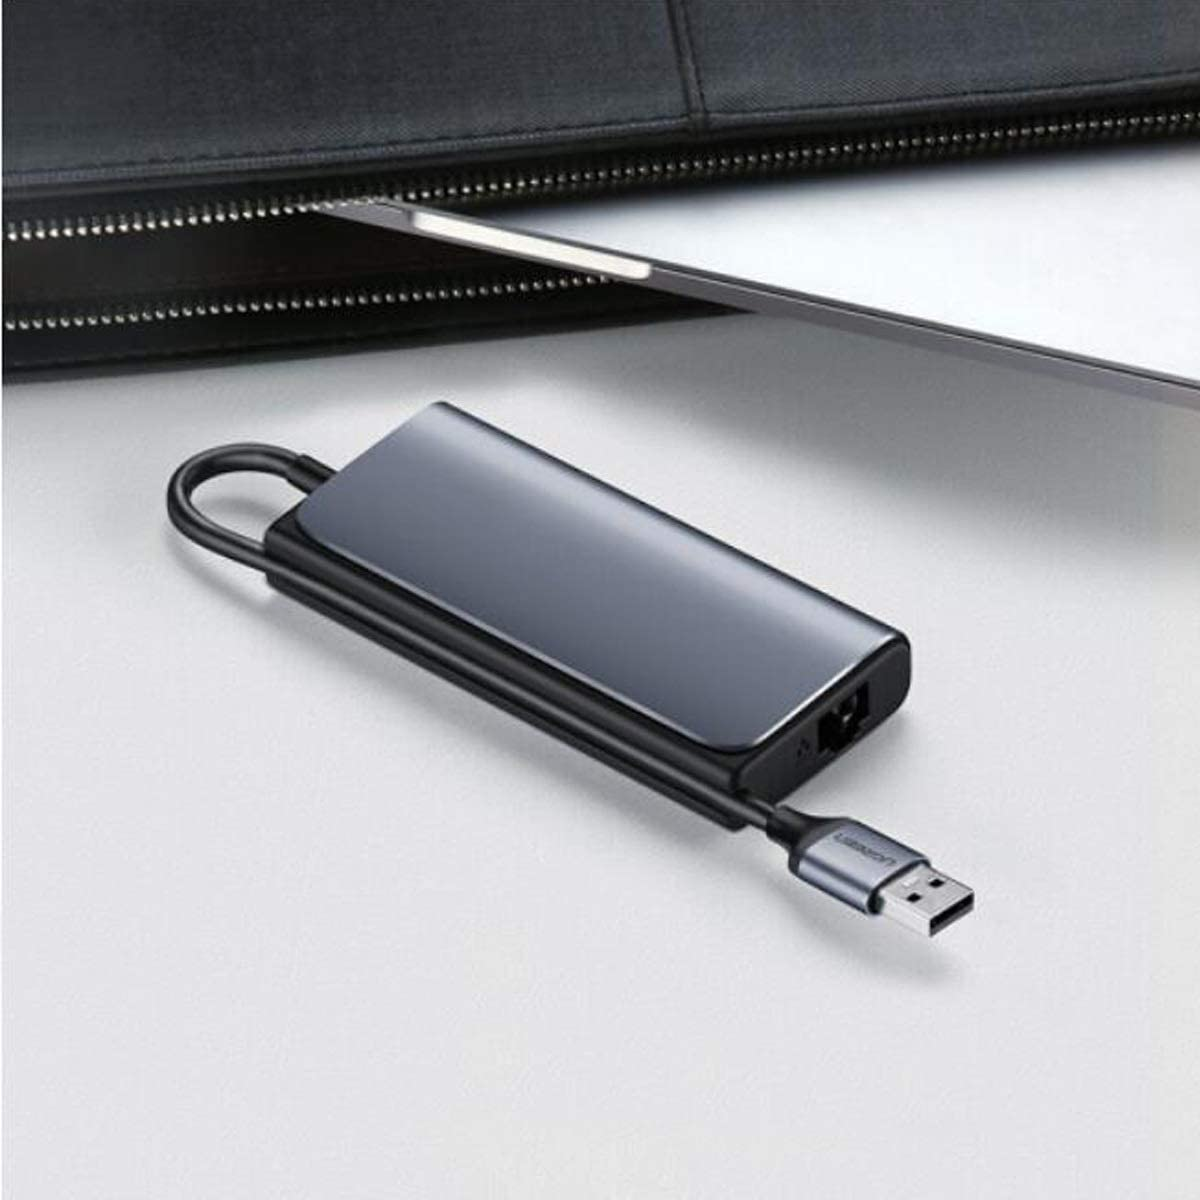 Color : Gray Wuhuizhenjingxiaobu Hub Gigabit Wired Network Port Network Card Converter Beautiful Appearance USB3.0HUB Splitter